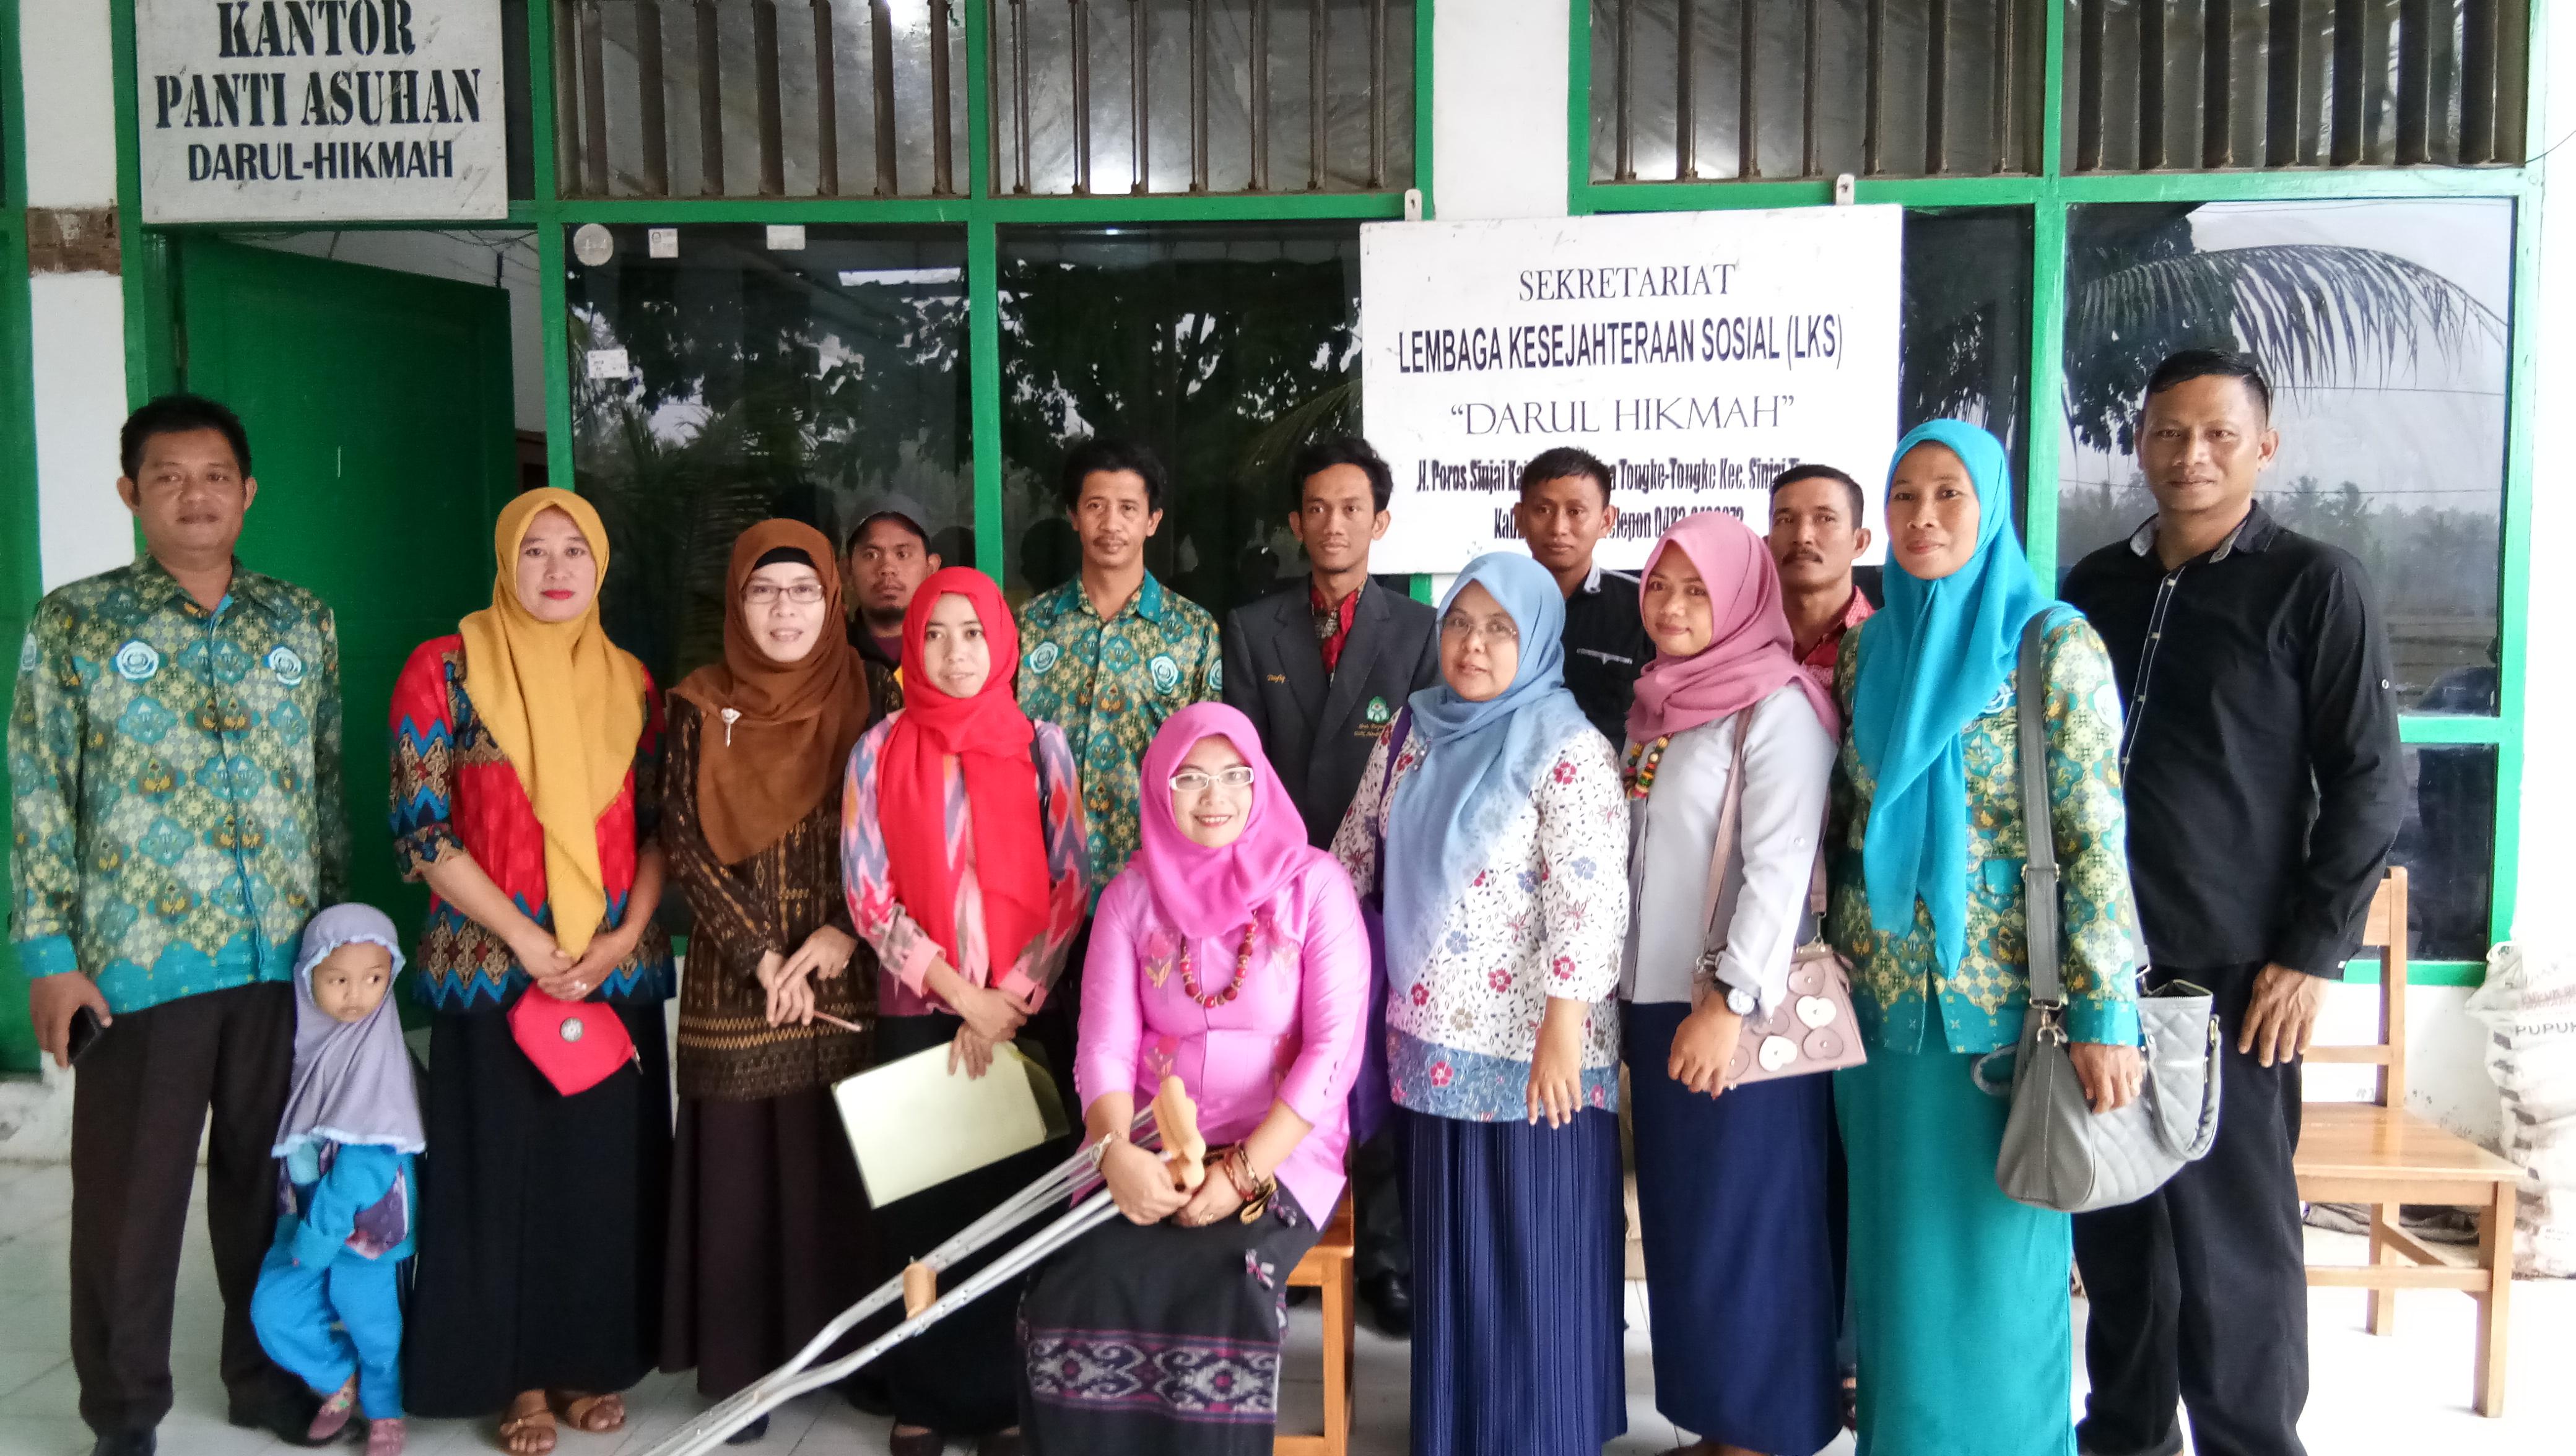 Pengabdian Masyarakat di Perpustakaan Yayasan Pesantren Darul Hikmah Kec. Sinjai Timur Kab. Sinjai